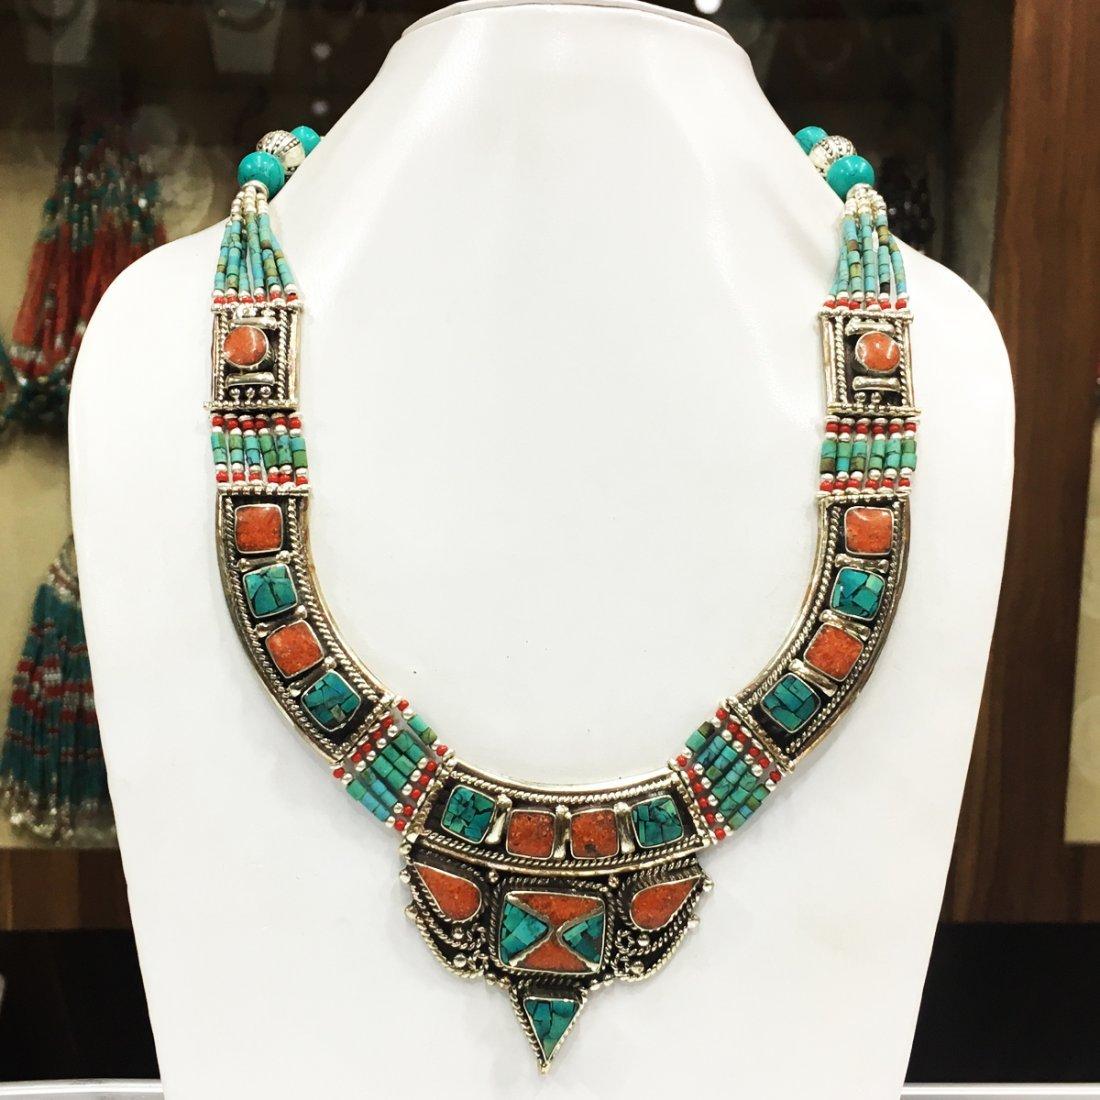 Turquoise & Coral Tibetan Handmade Necklace